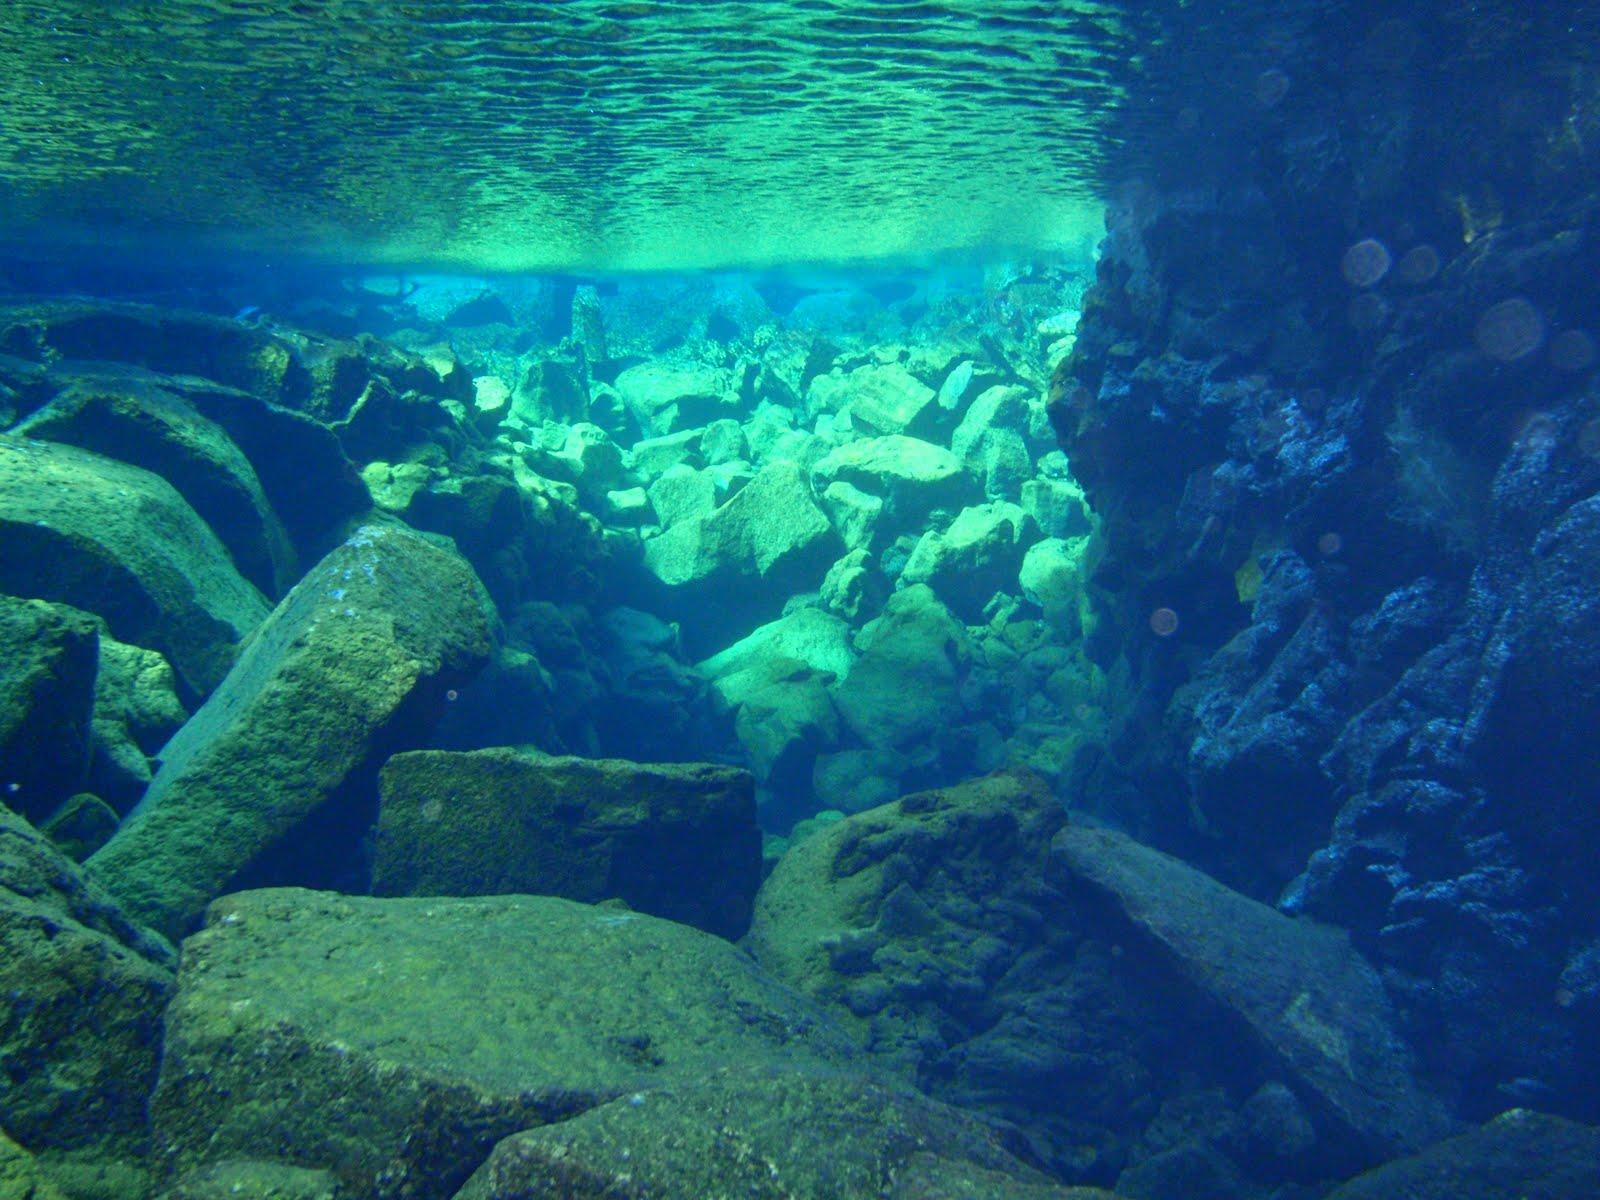 25 [picture ] Nan Madol submerge